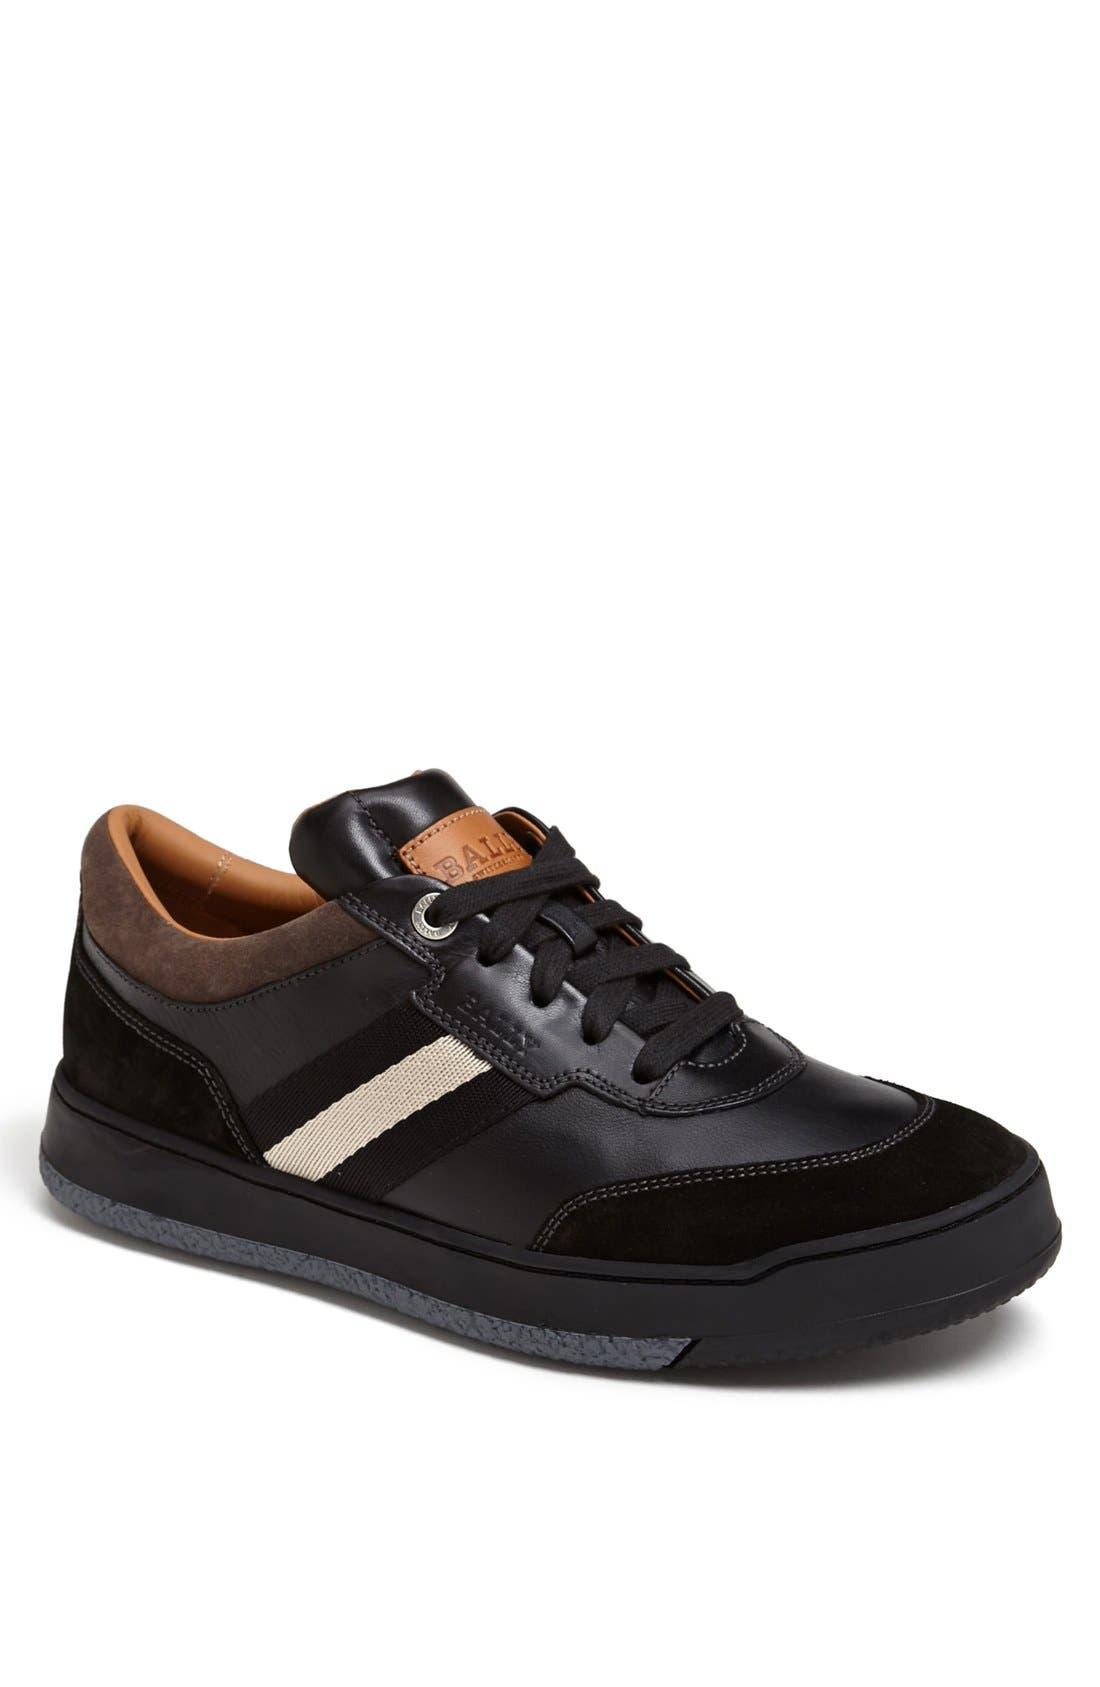 Main Image - Bally 'Odemis' Sneaker